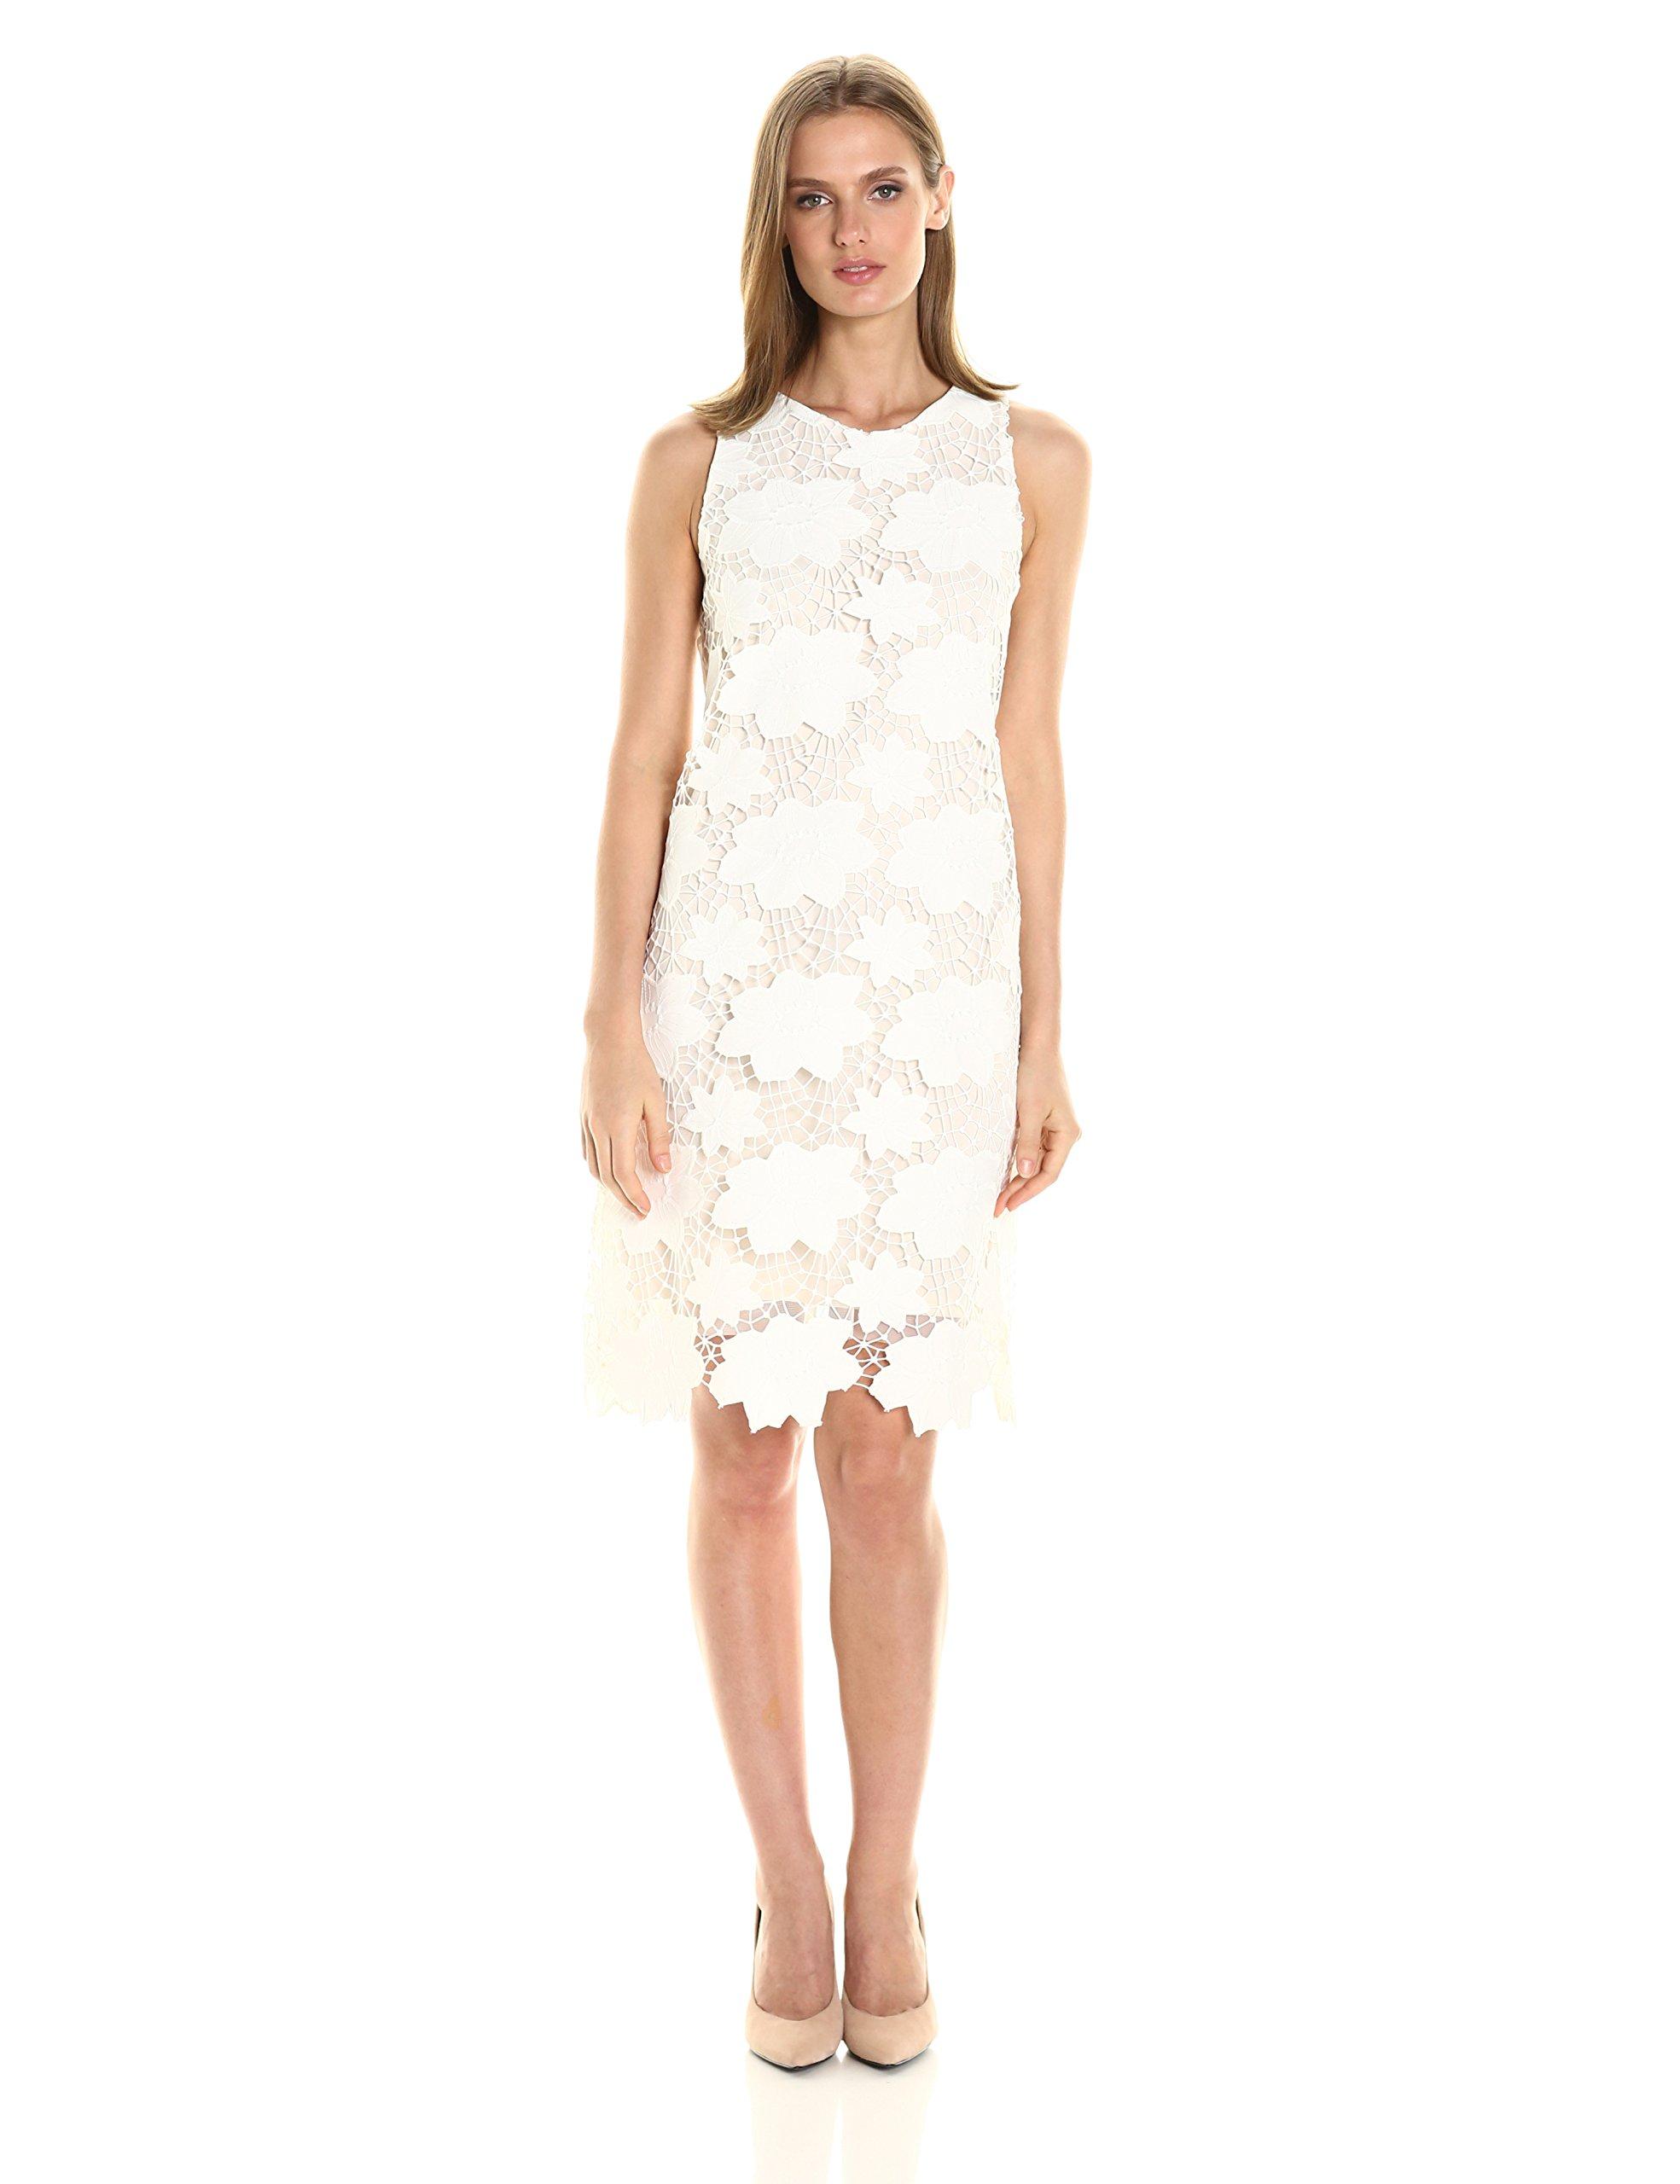 Julia Jordan Women's All Over Floral Printed Sleeveless Dress, Ivory, 14 by Julia Jordan